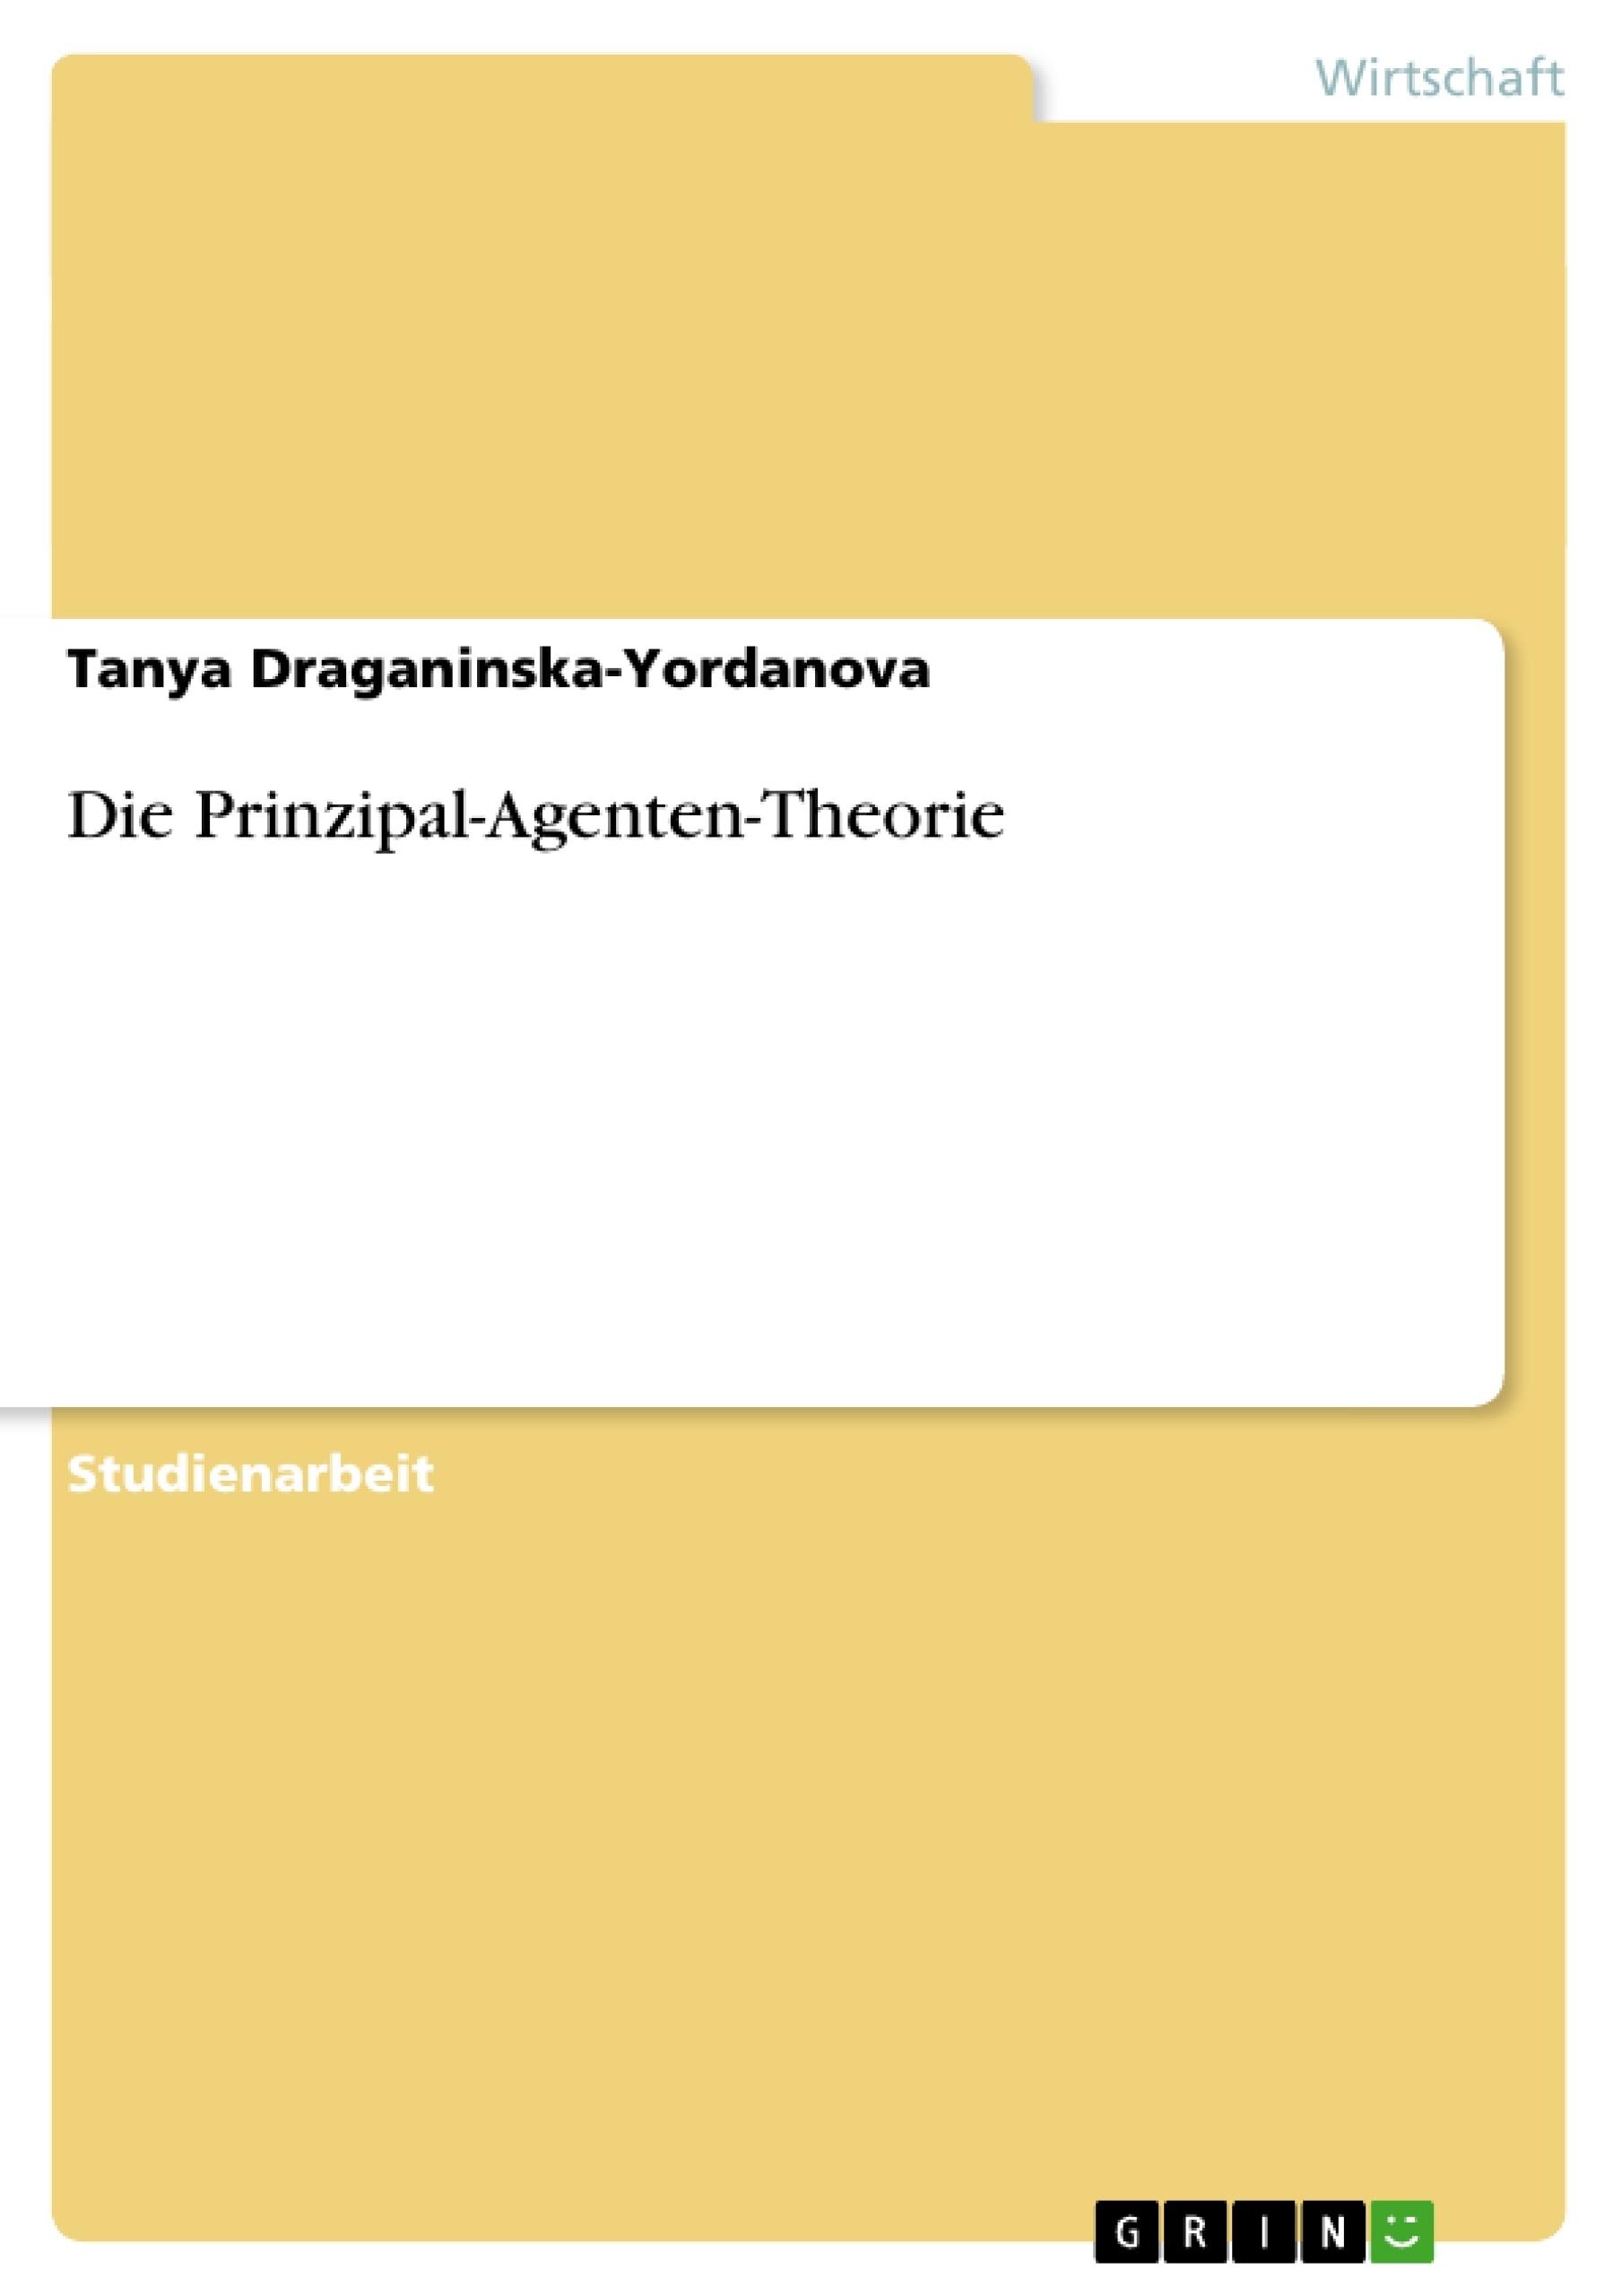 Titel: Die Prinzipal-Agenten-Theorie